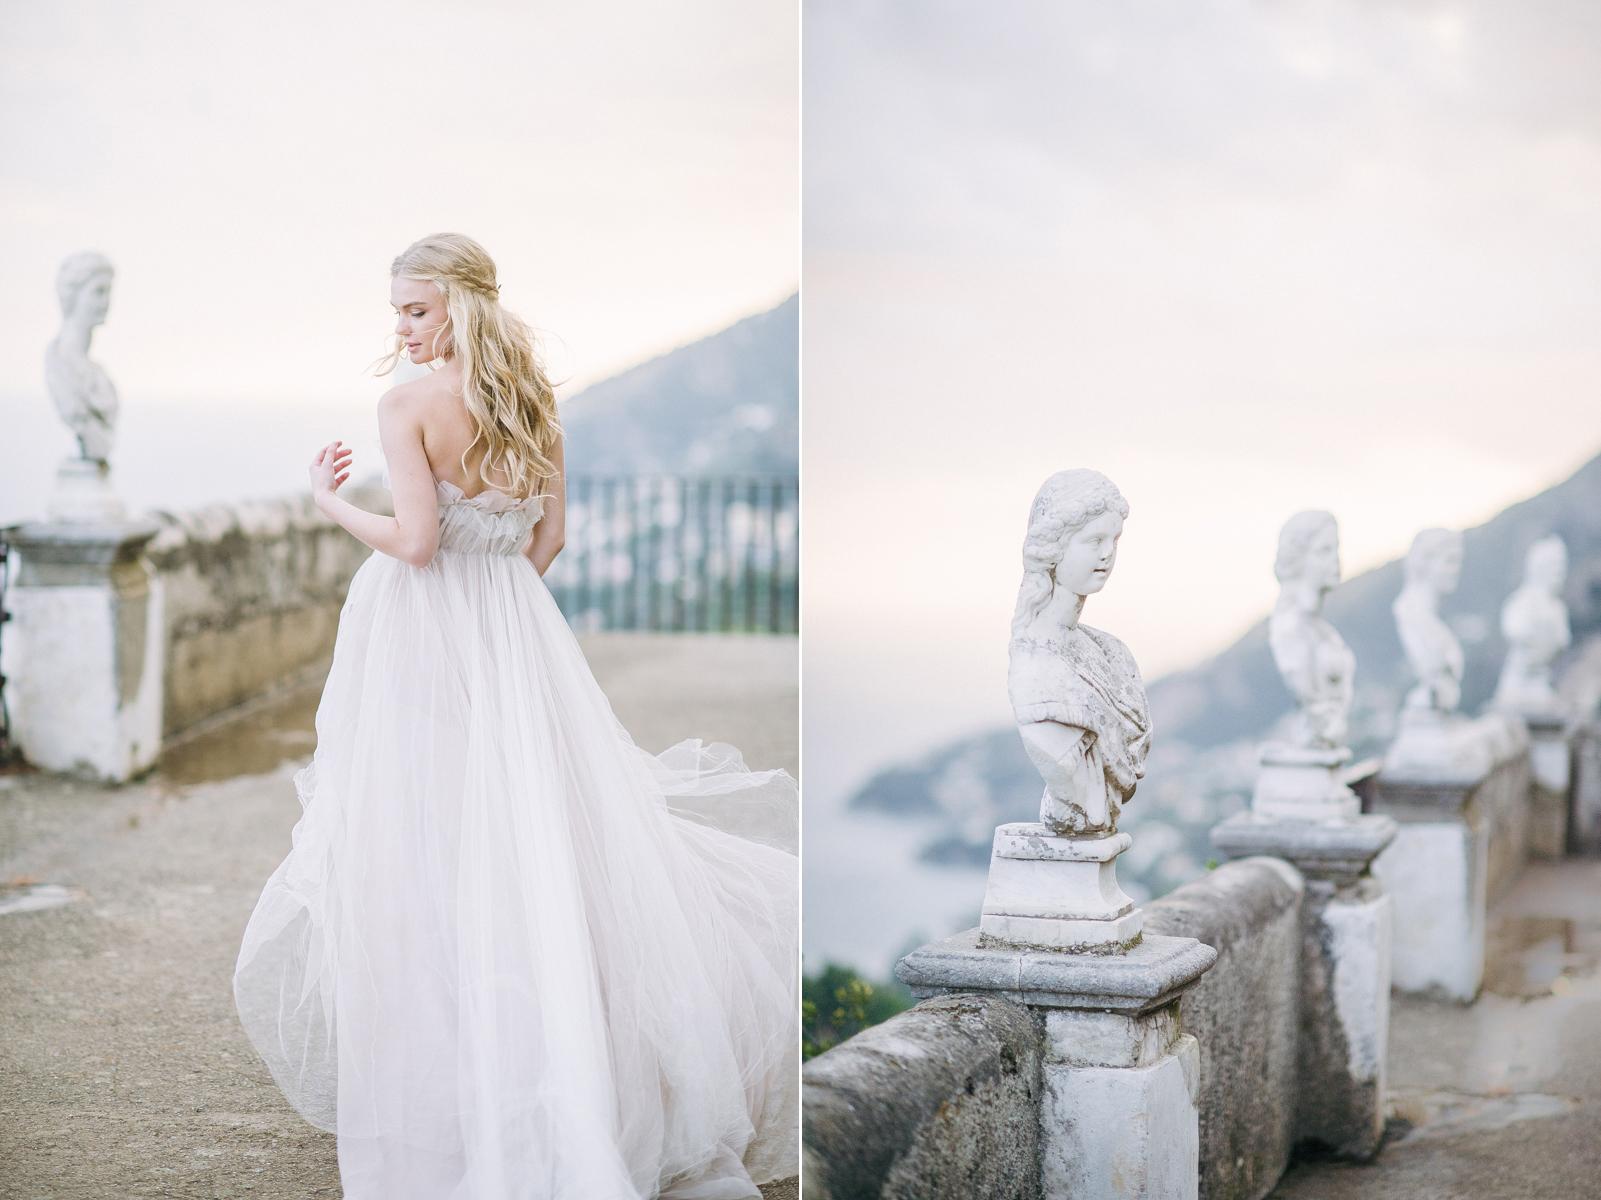 Boheme-Moon-wedding-photography-ravello-italy_14.jpg